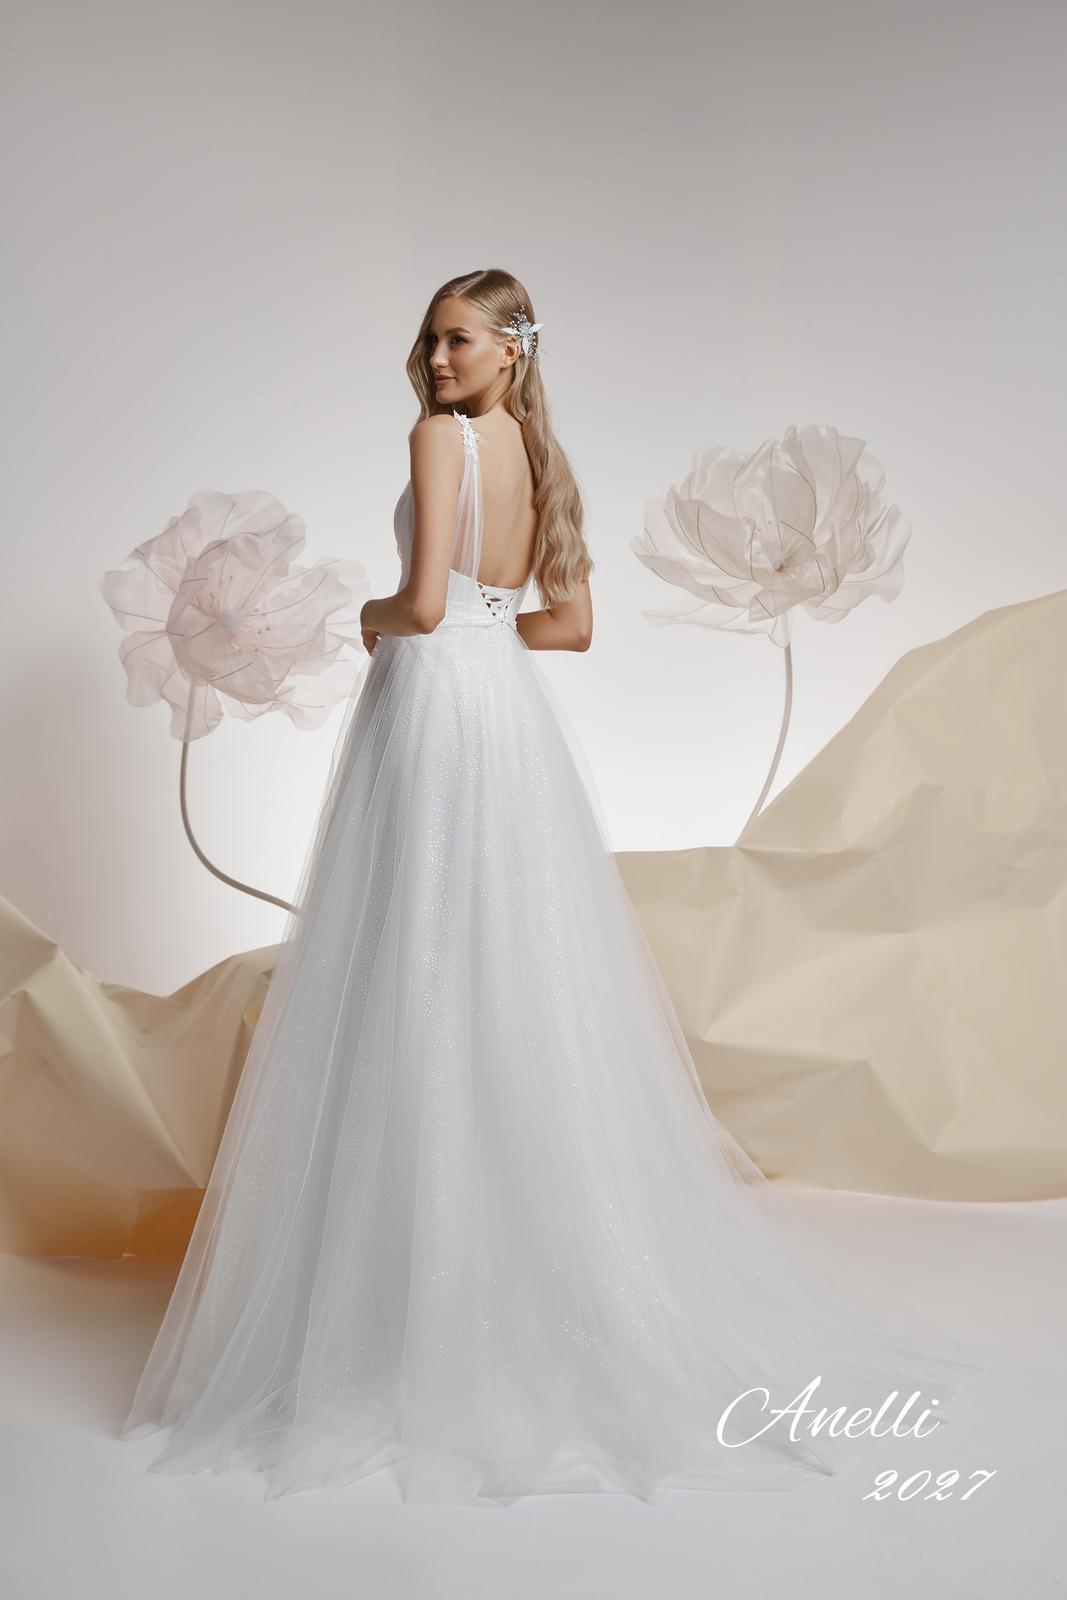 Svadobné šaty - Imagine 2027 - Obrázok č. 2